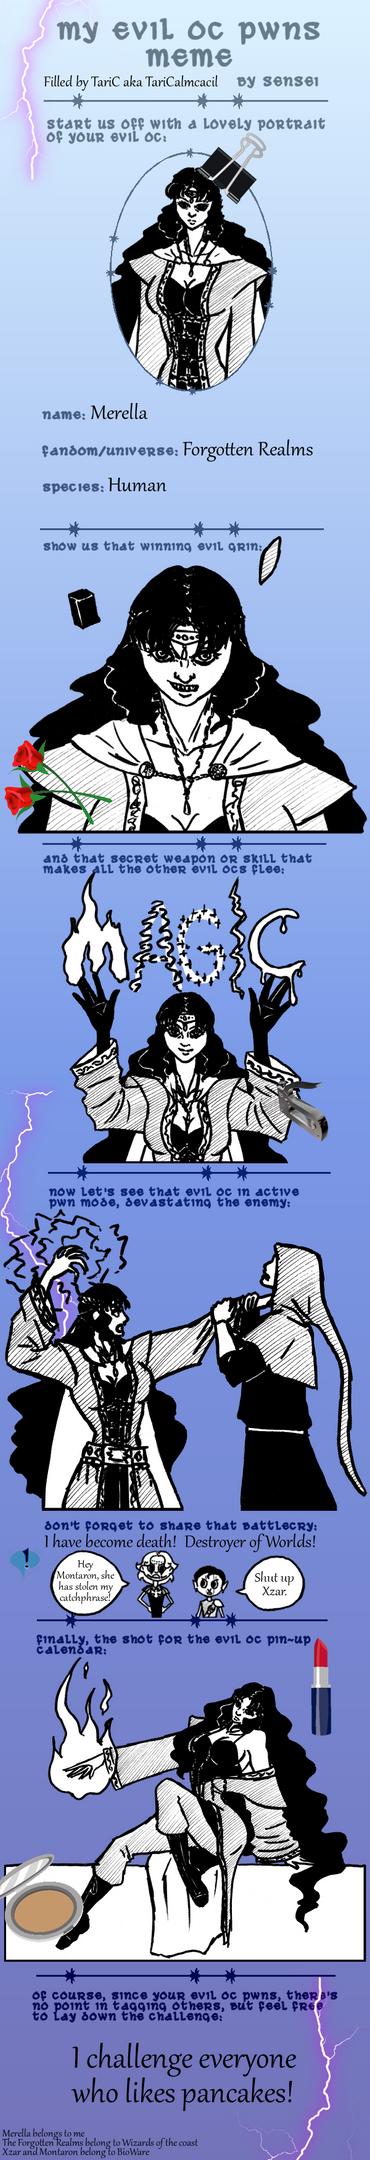 My evil OC pwns Meme - Merella by TariToons